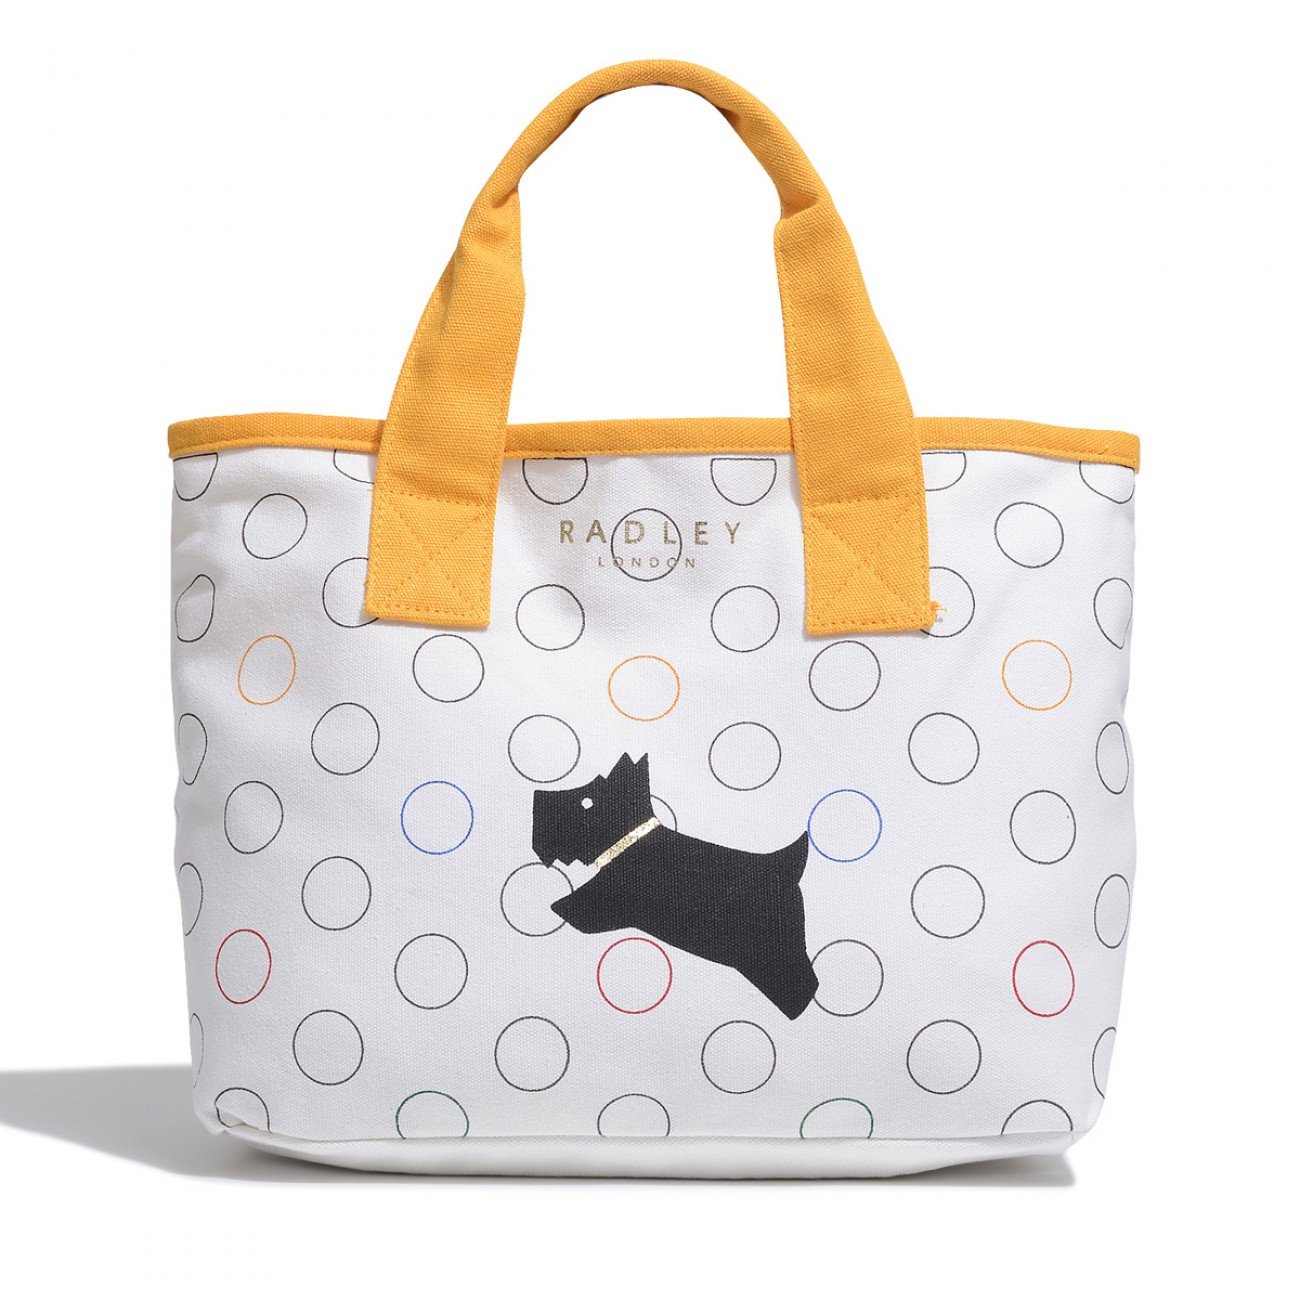 Winning Radley Small Crook Grab Bag